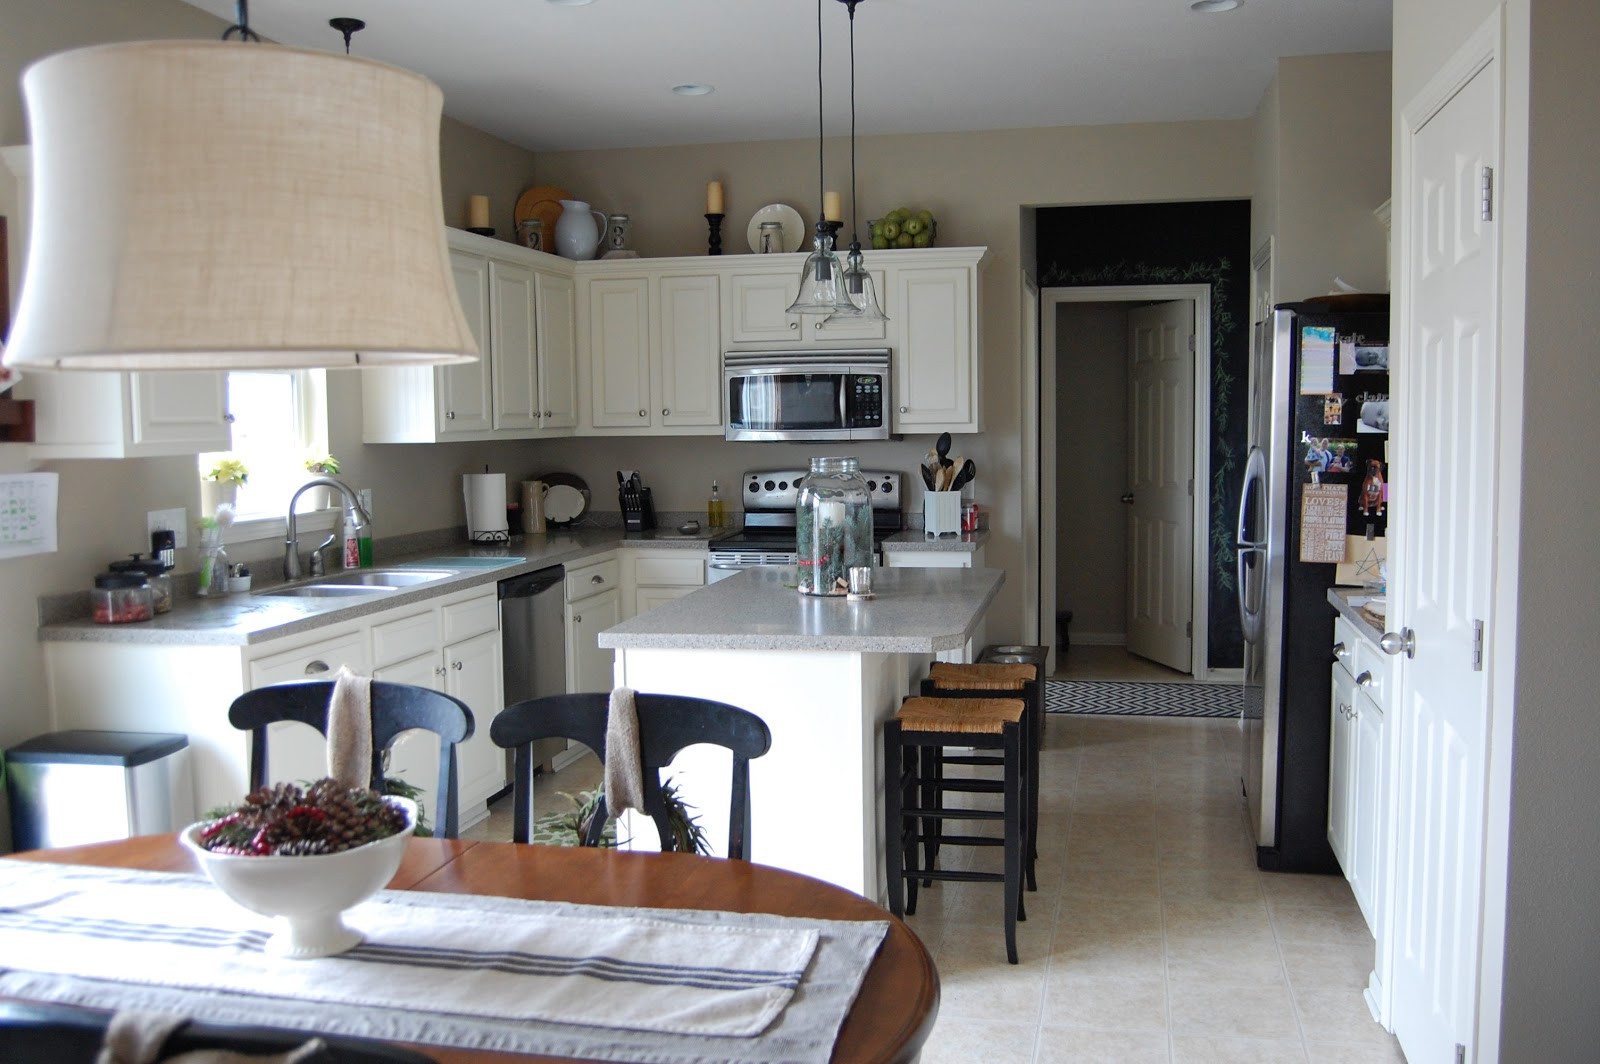 Best ideas about DIY Kitchen Updates . Save or Pin the V Side DIY Kitchen Island Update Now.